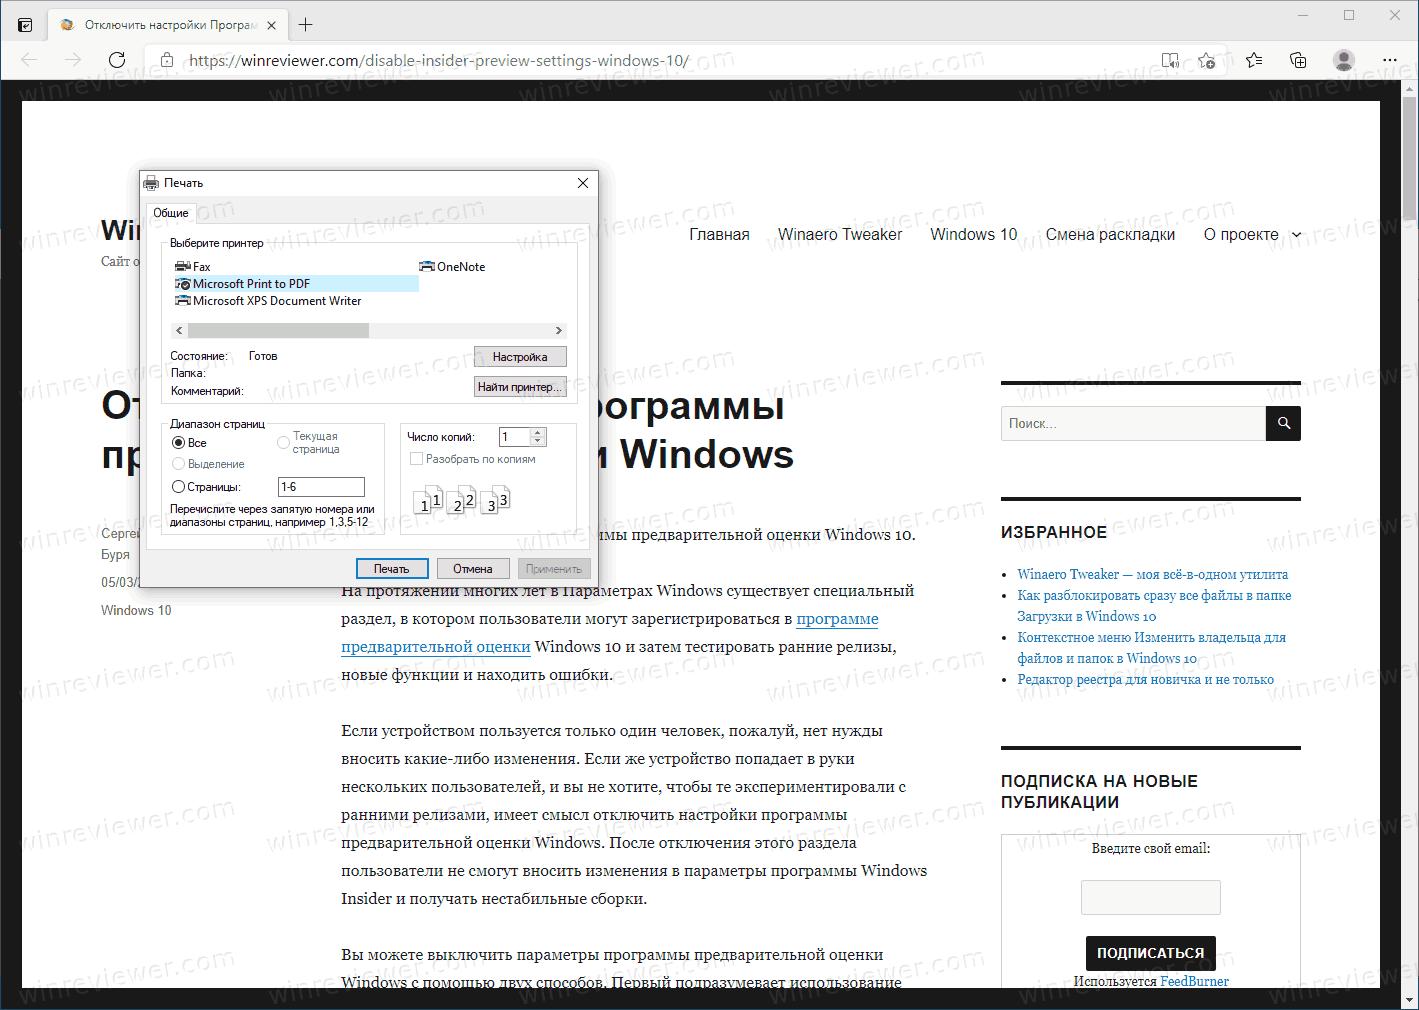 Системный диалог печати в Microsoft Edge